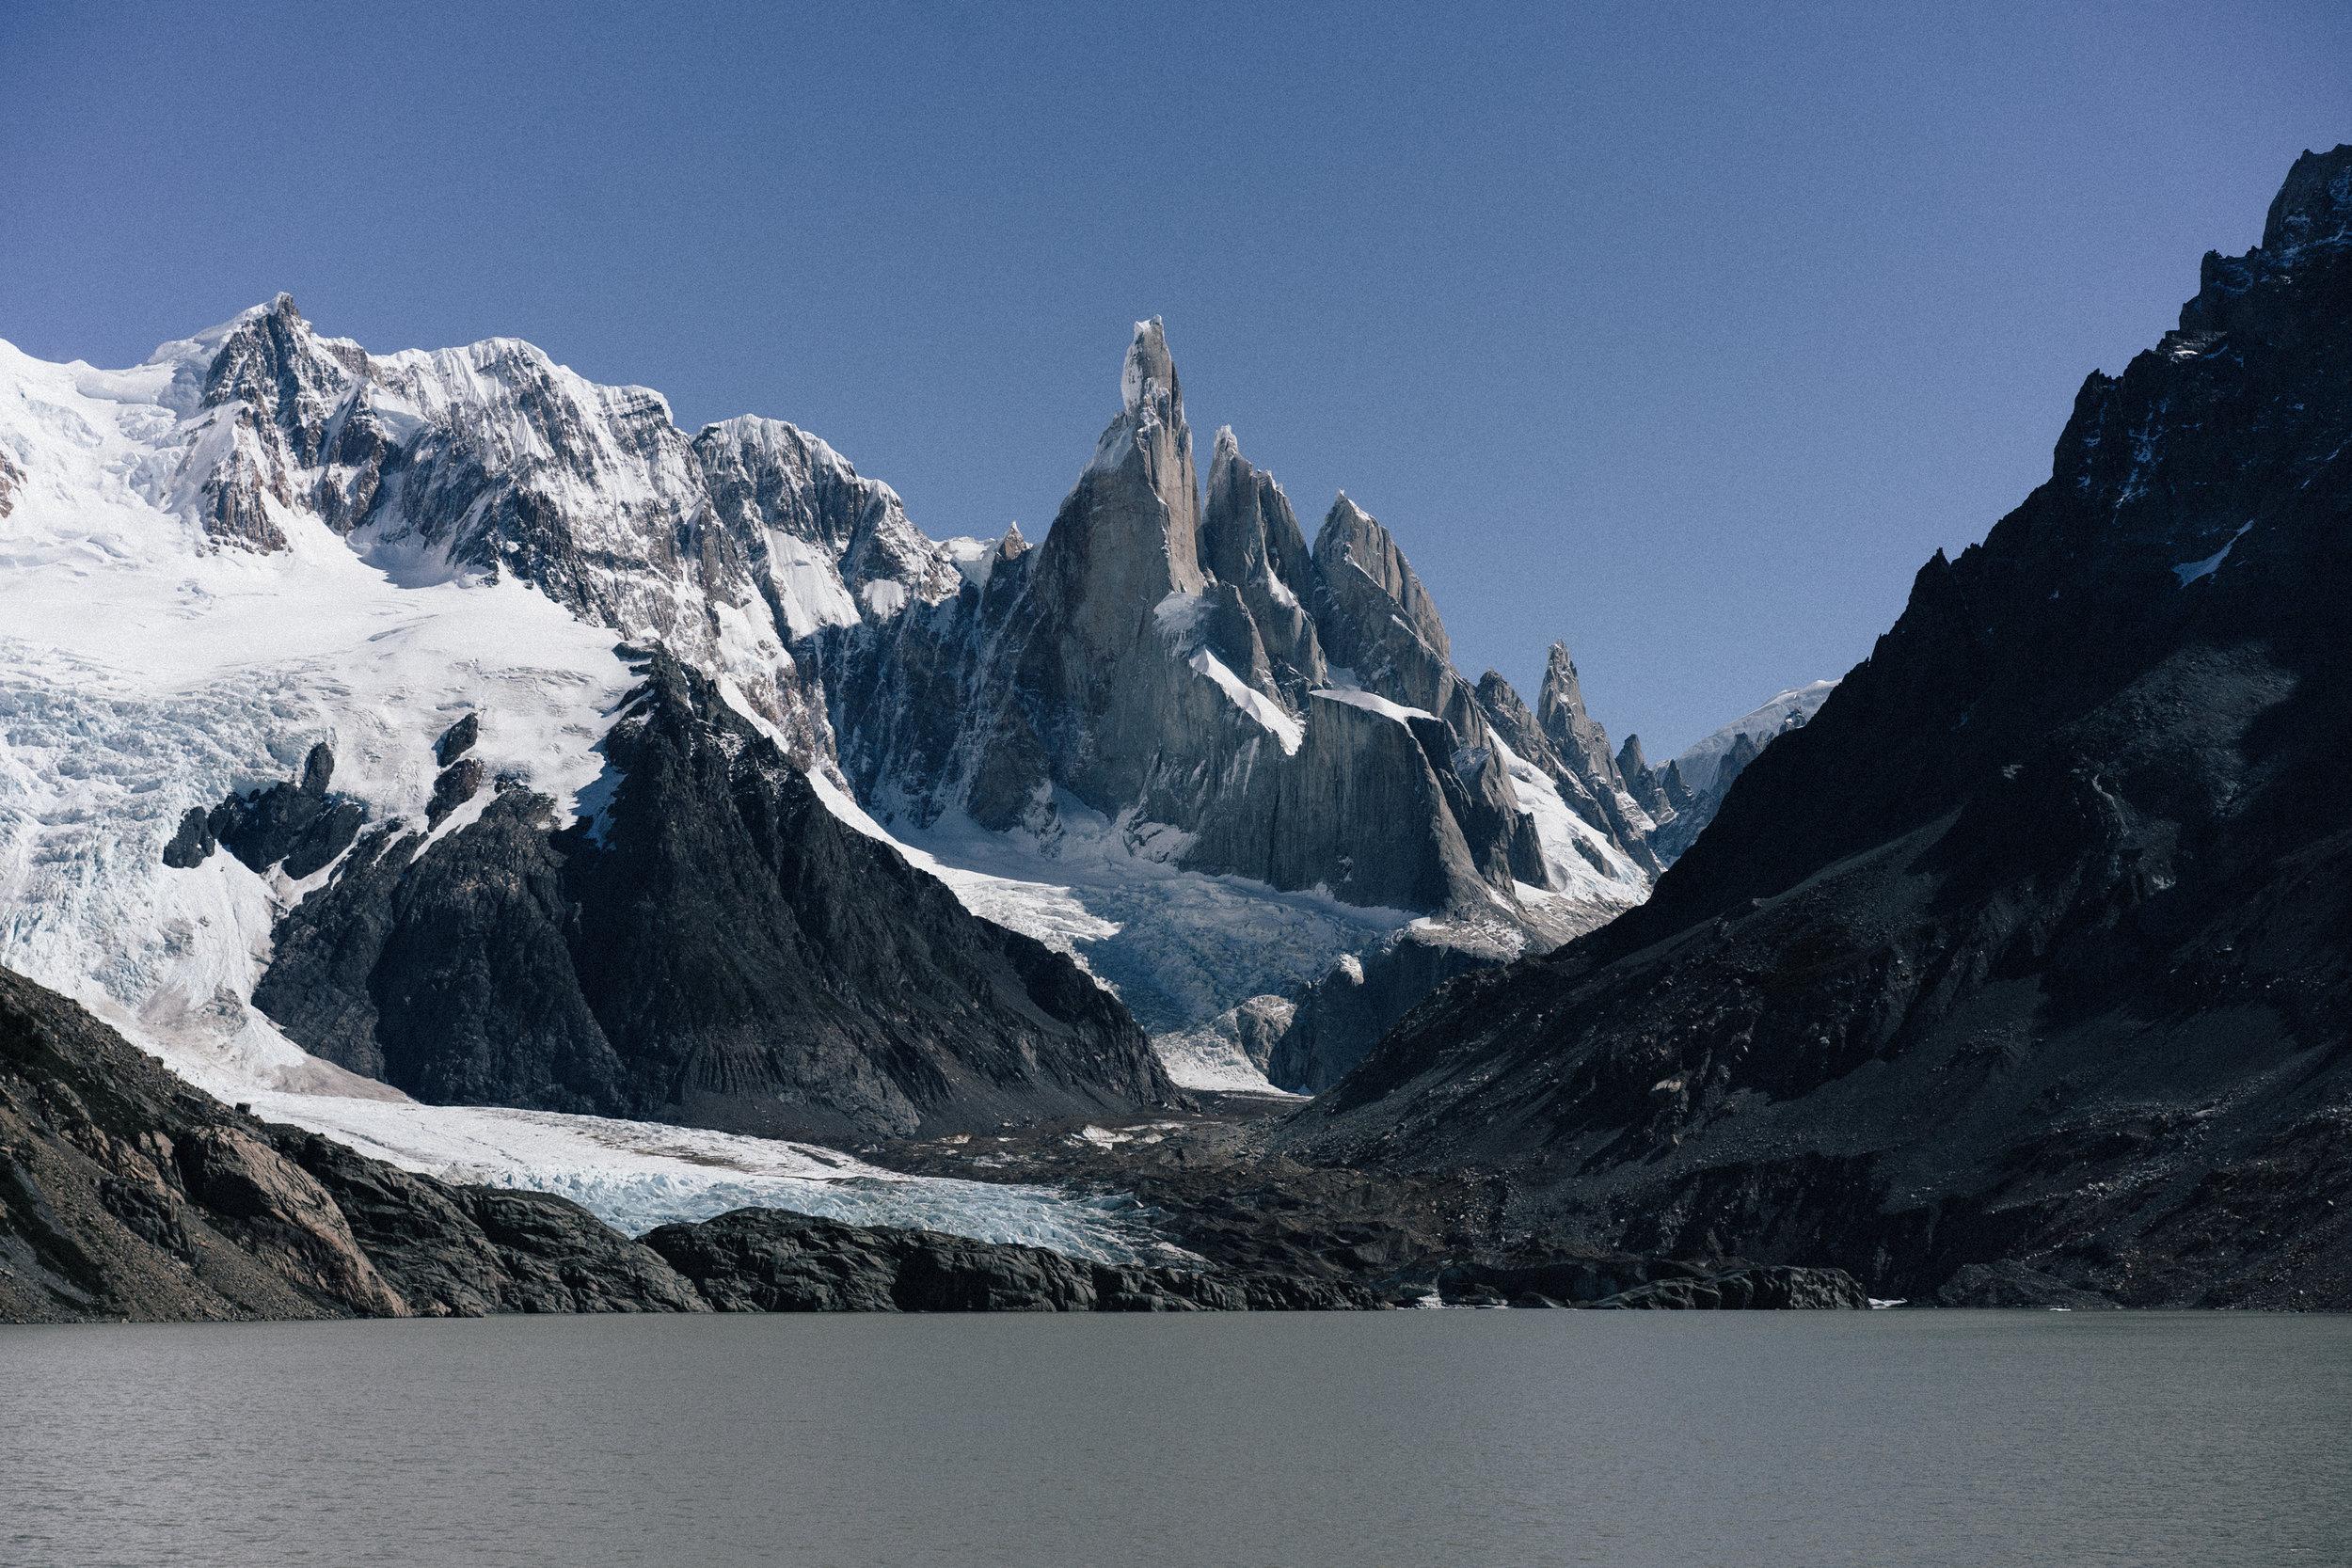 20190307_Patagonia_39.jpg